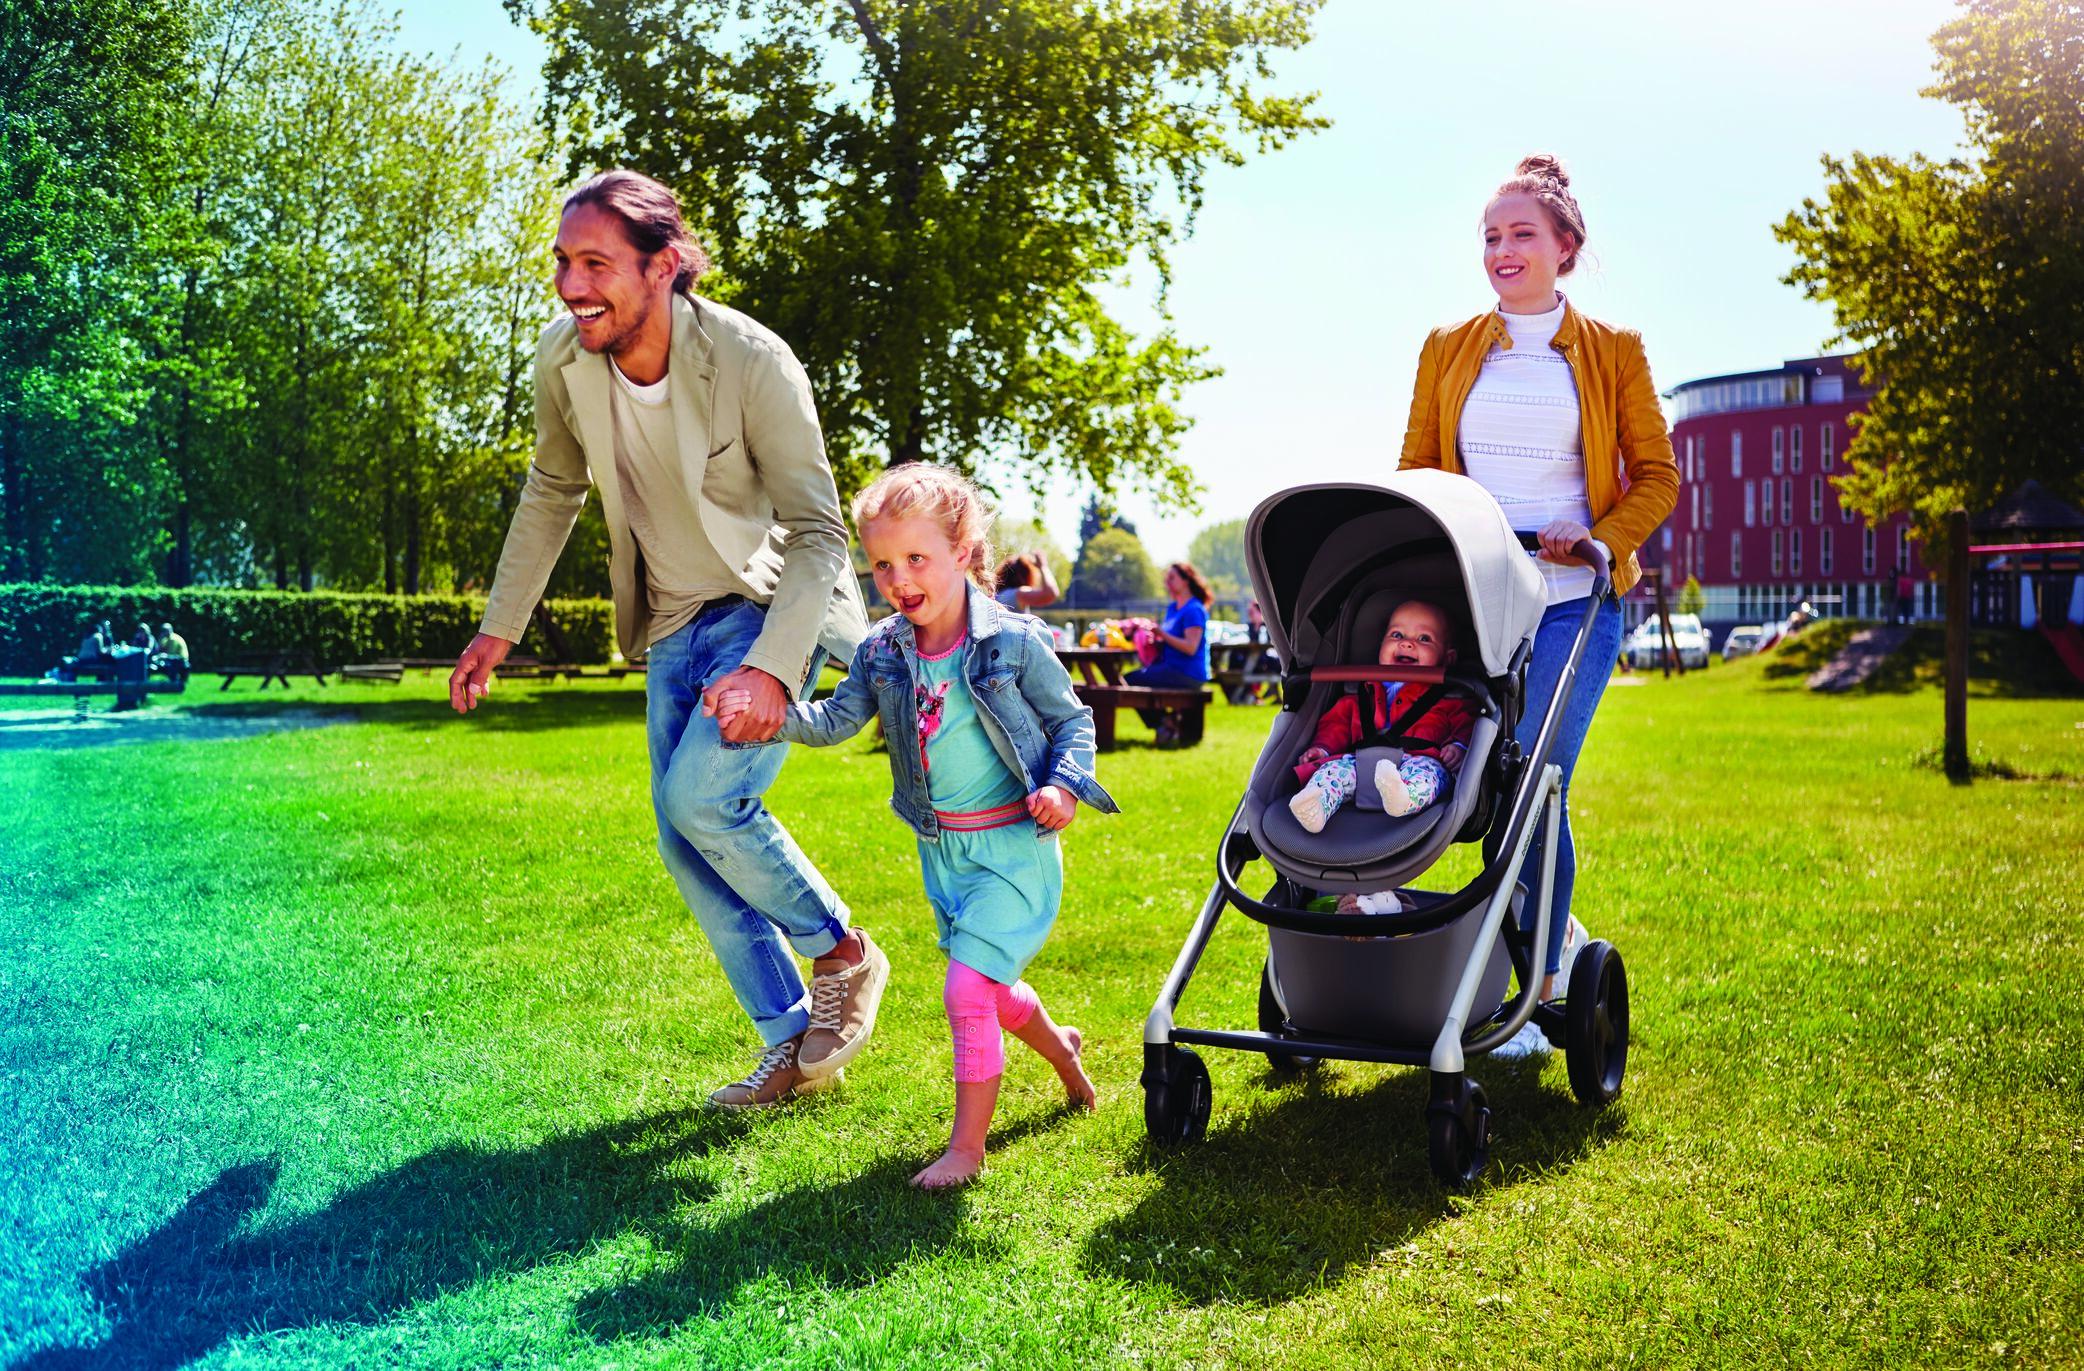 BBC1311_2018_bebeconfort_stroller_Lila_Lifestyle_Spring-Playground_dadandgirlrunningupfrontmumstrolling_Landscape